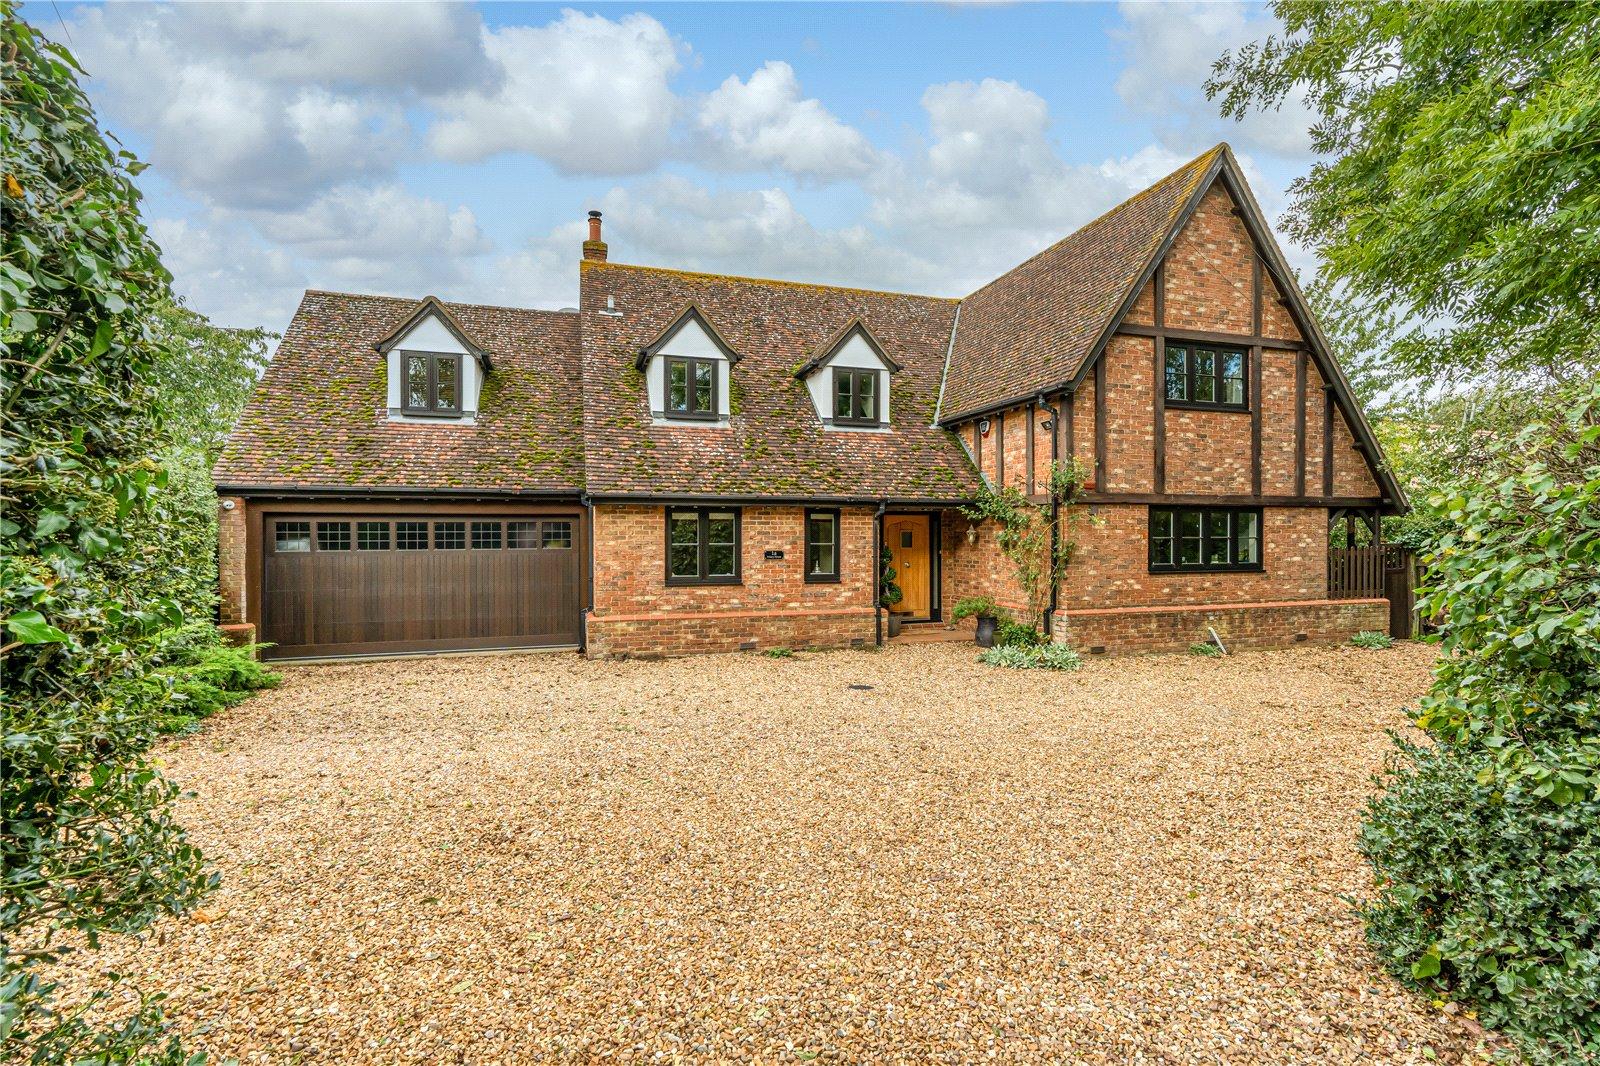 5 bed house for sale in Wardhedges, MK45 5EE, MK45